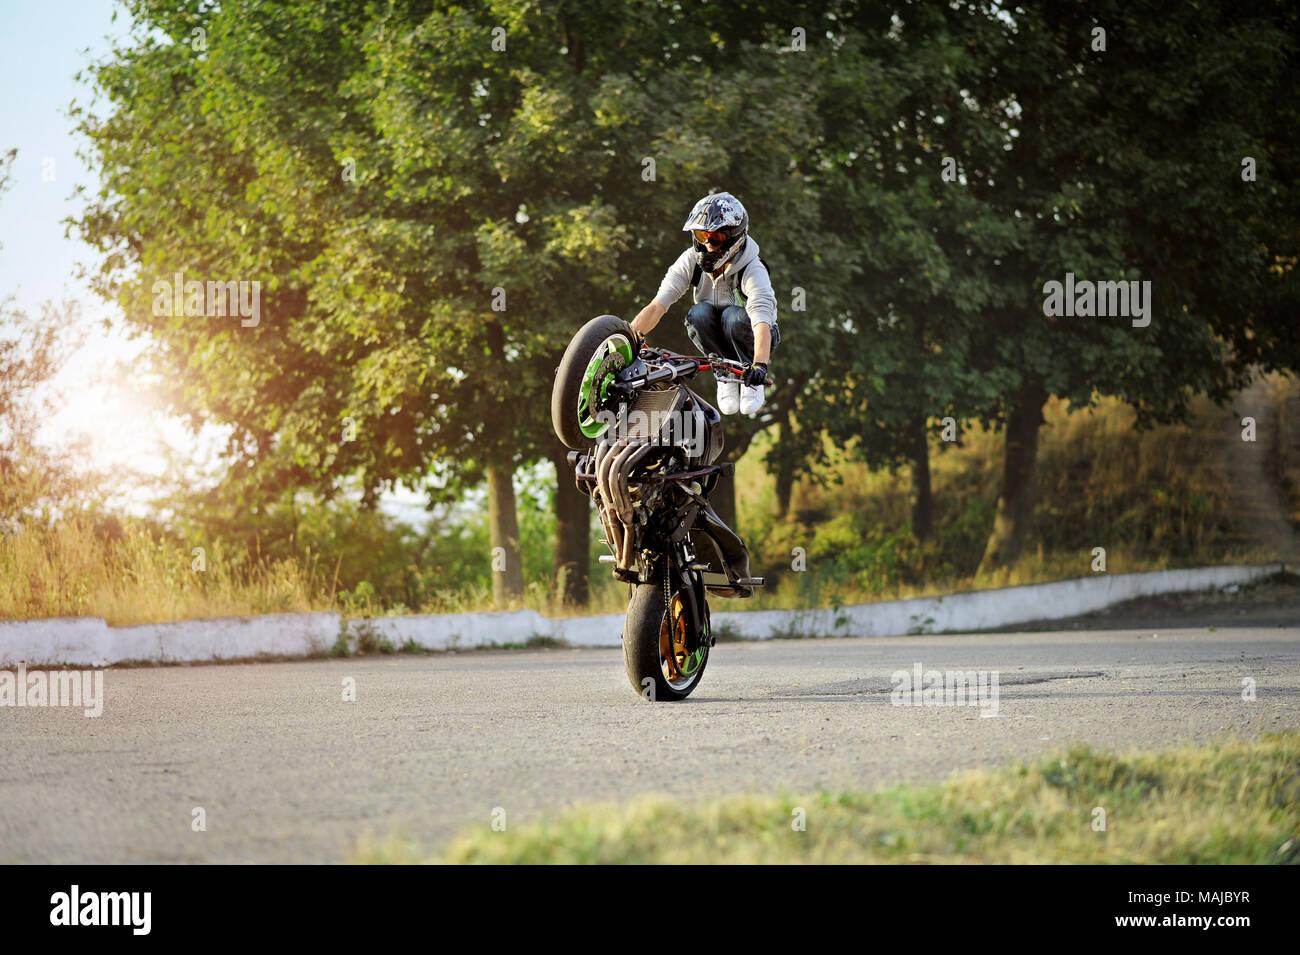 Ivano-Frankivsk, Ukraine - 28 August 2015 : Male biker is training in making tricks on sport motorcycle on summer cite street. Green trees on background. Wearing helmet. Stock Photo